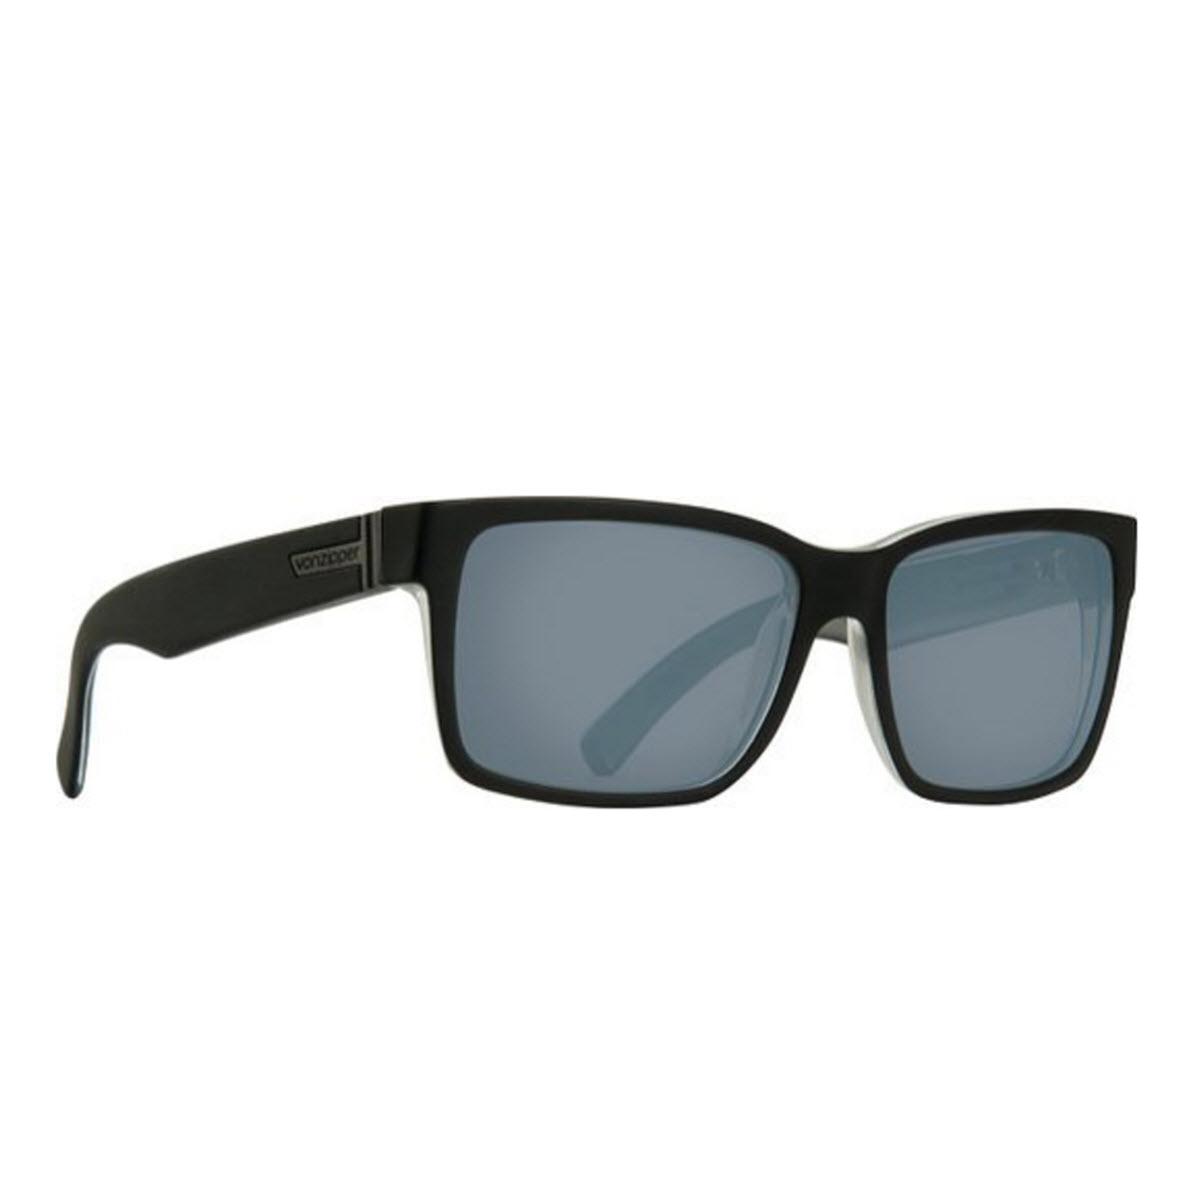 Product image of VonZipper Elmore Sunglasses in Black Satin - Grey Chrome Lens